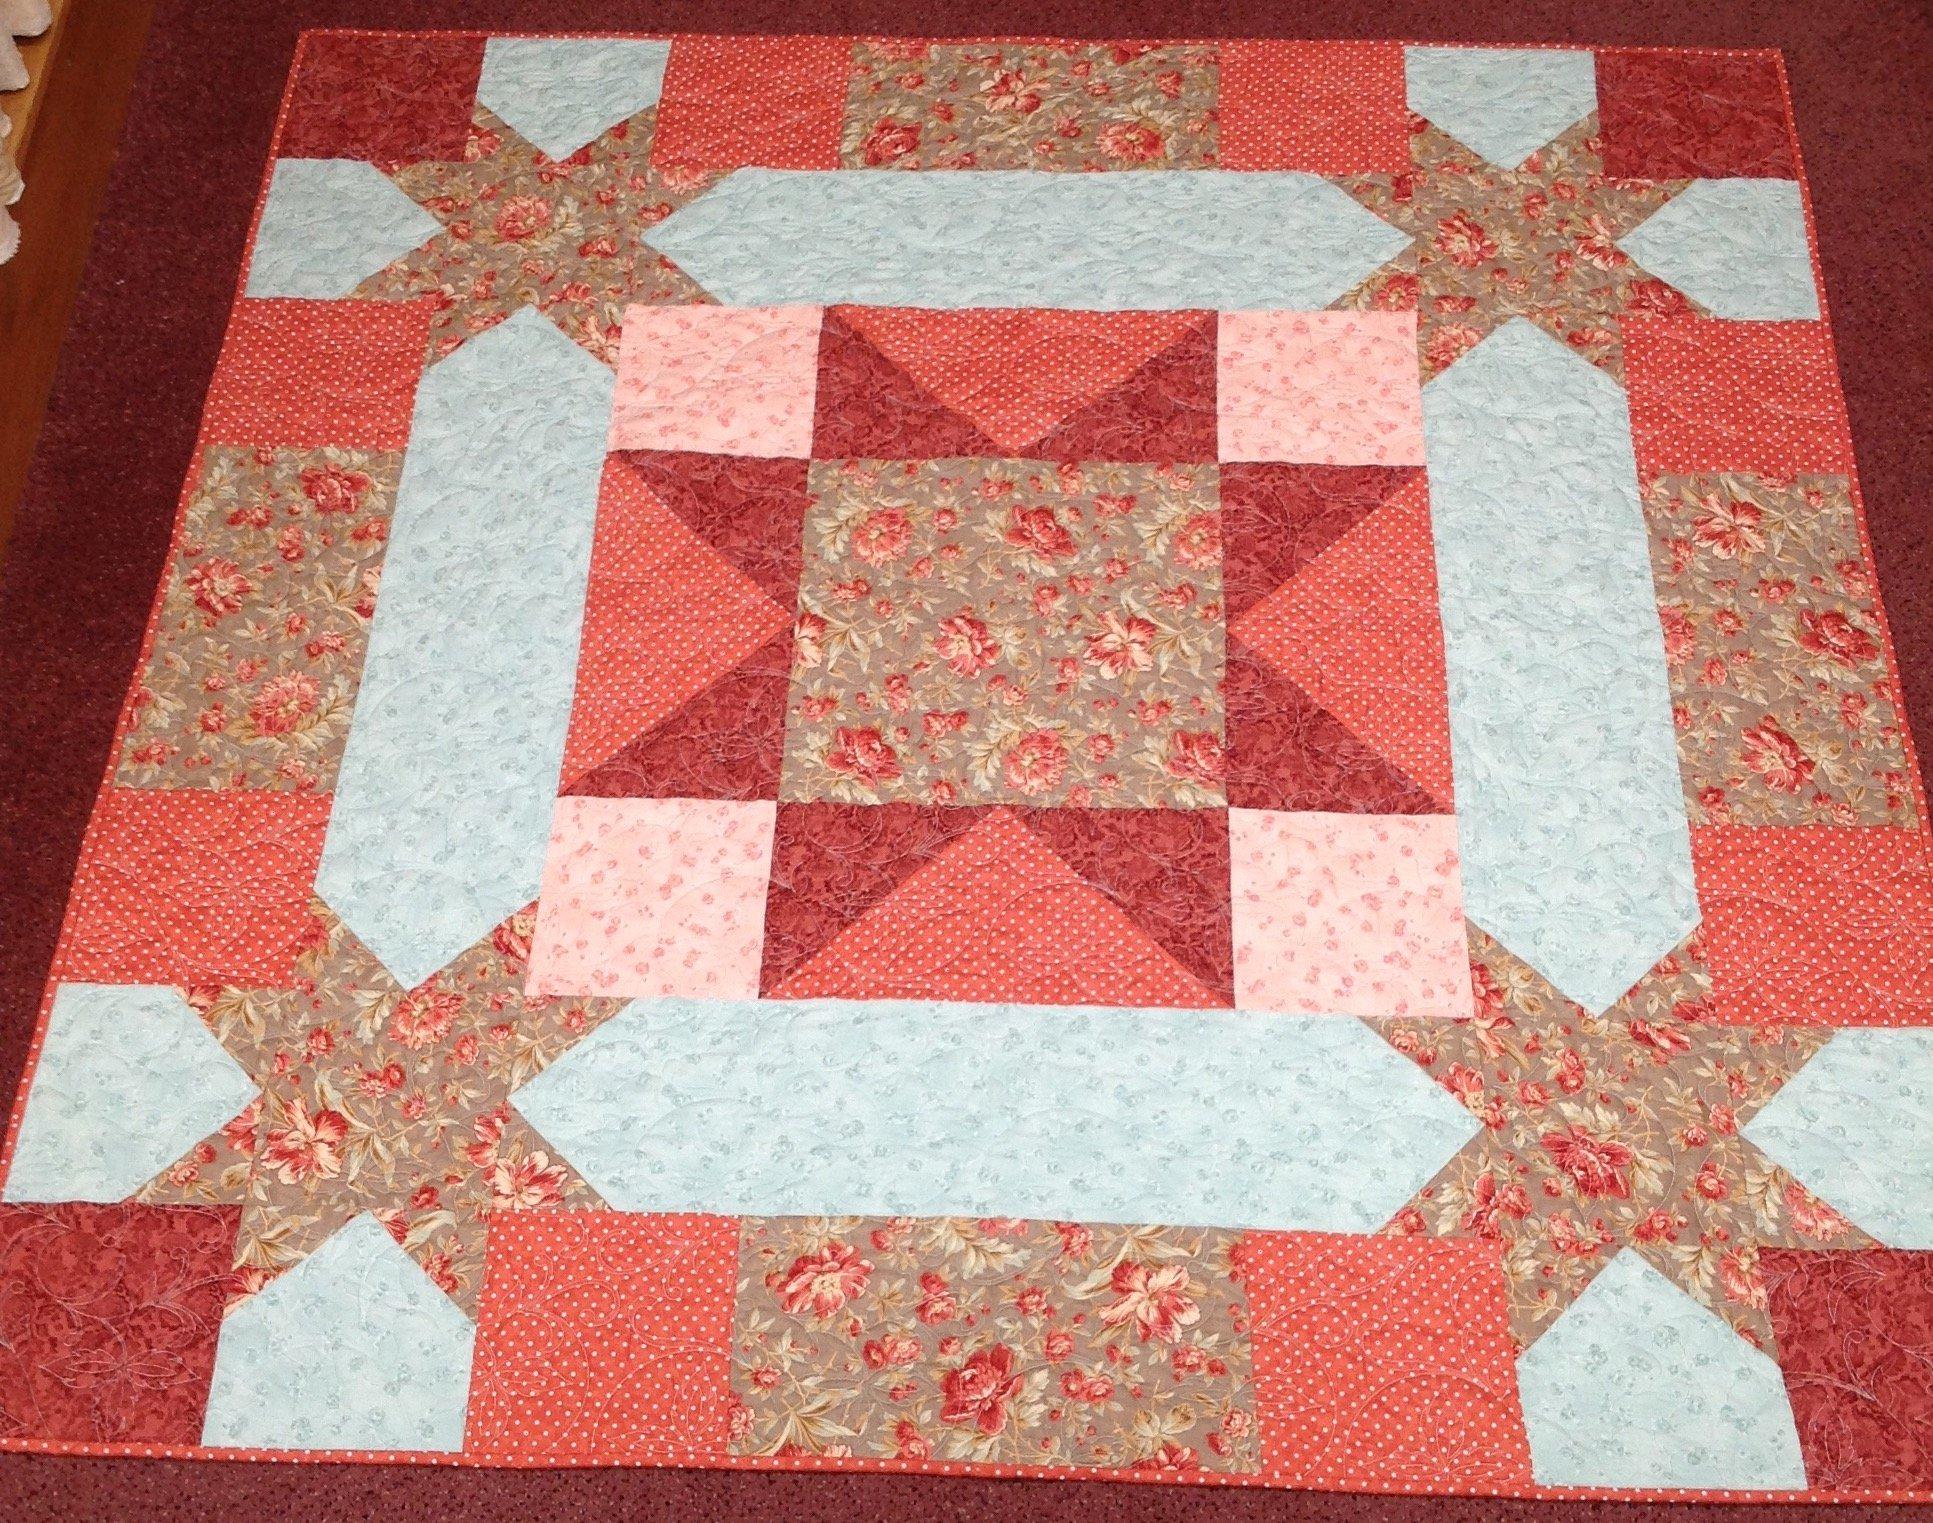 Floral Star Quilt 66x66